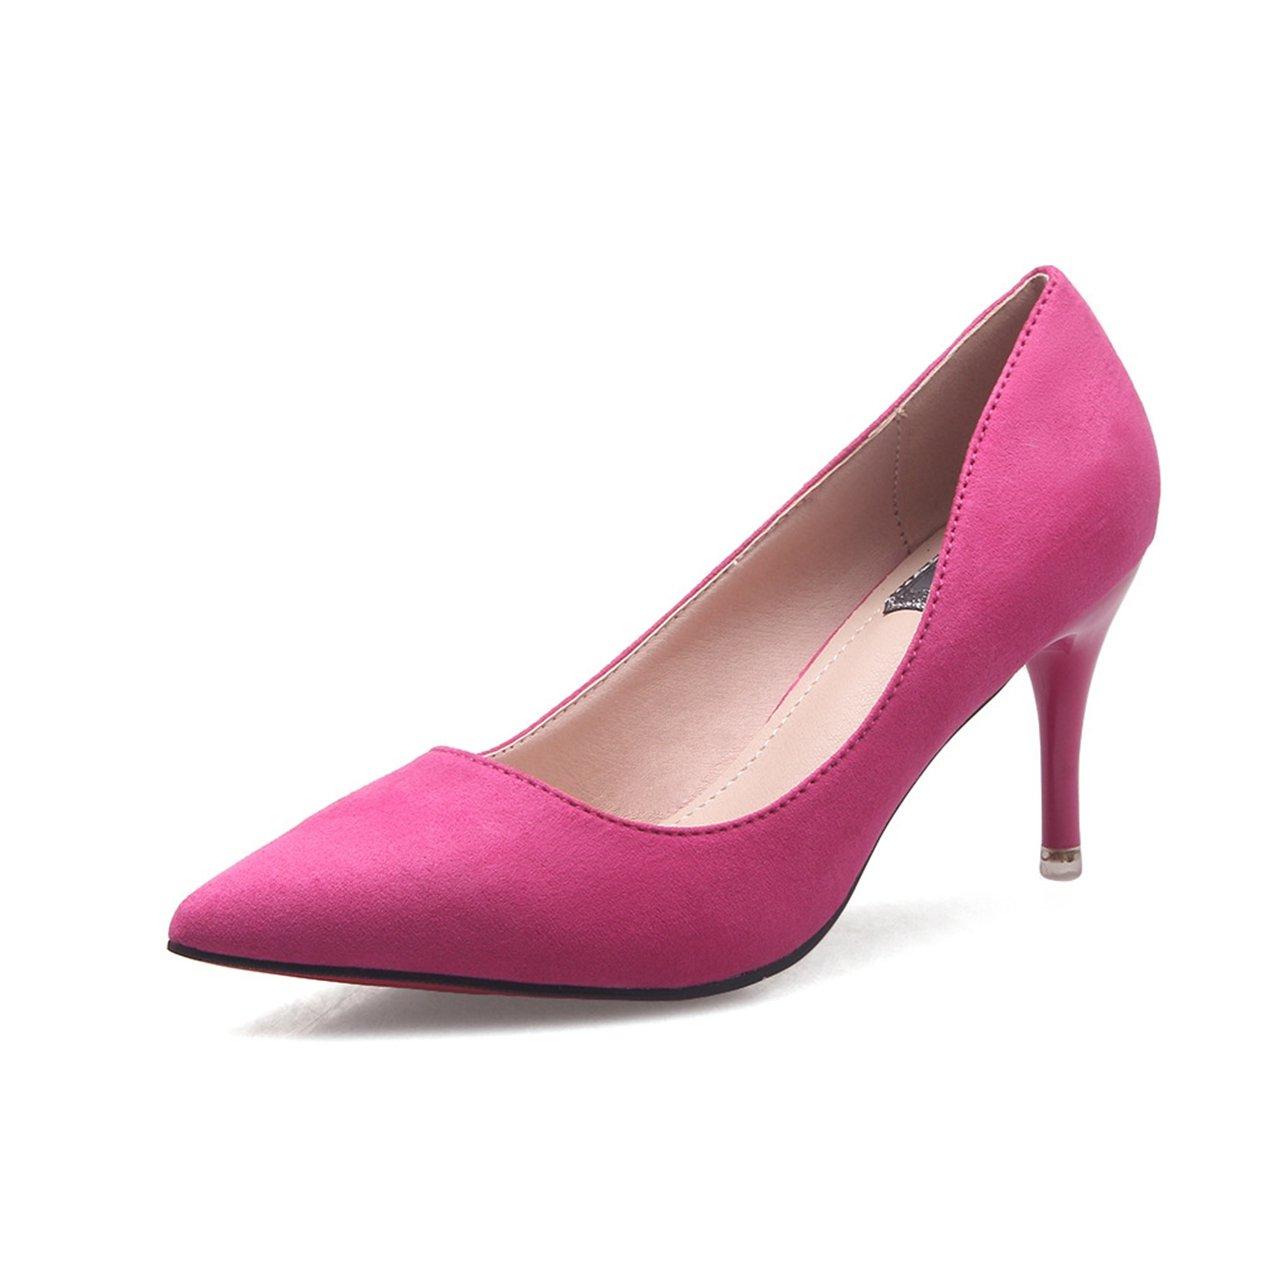 Unbekannt Damen Pumps Elegant Spitz Zehen Atmungsaktives Schuhe Nubukleder Rutschfest Modische OL Schuhe Atmungsaktives Brautschuhe Rosarot 37 EU 434a13